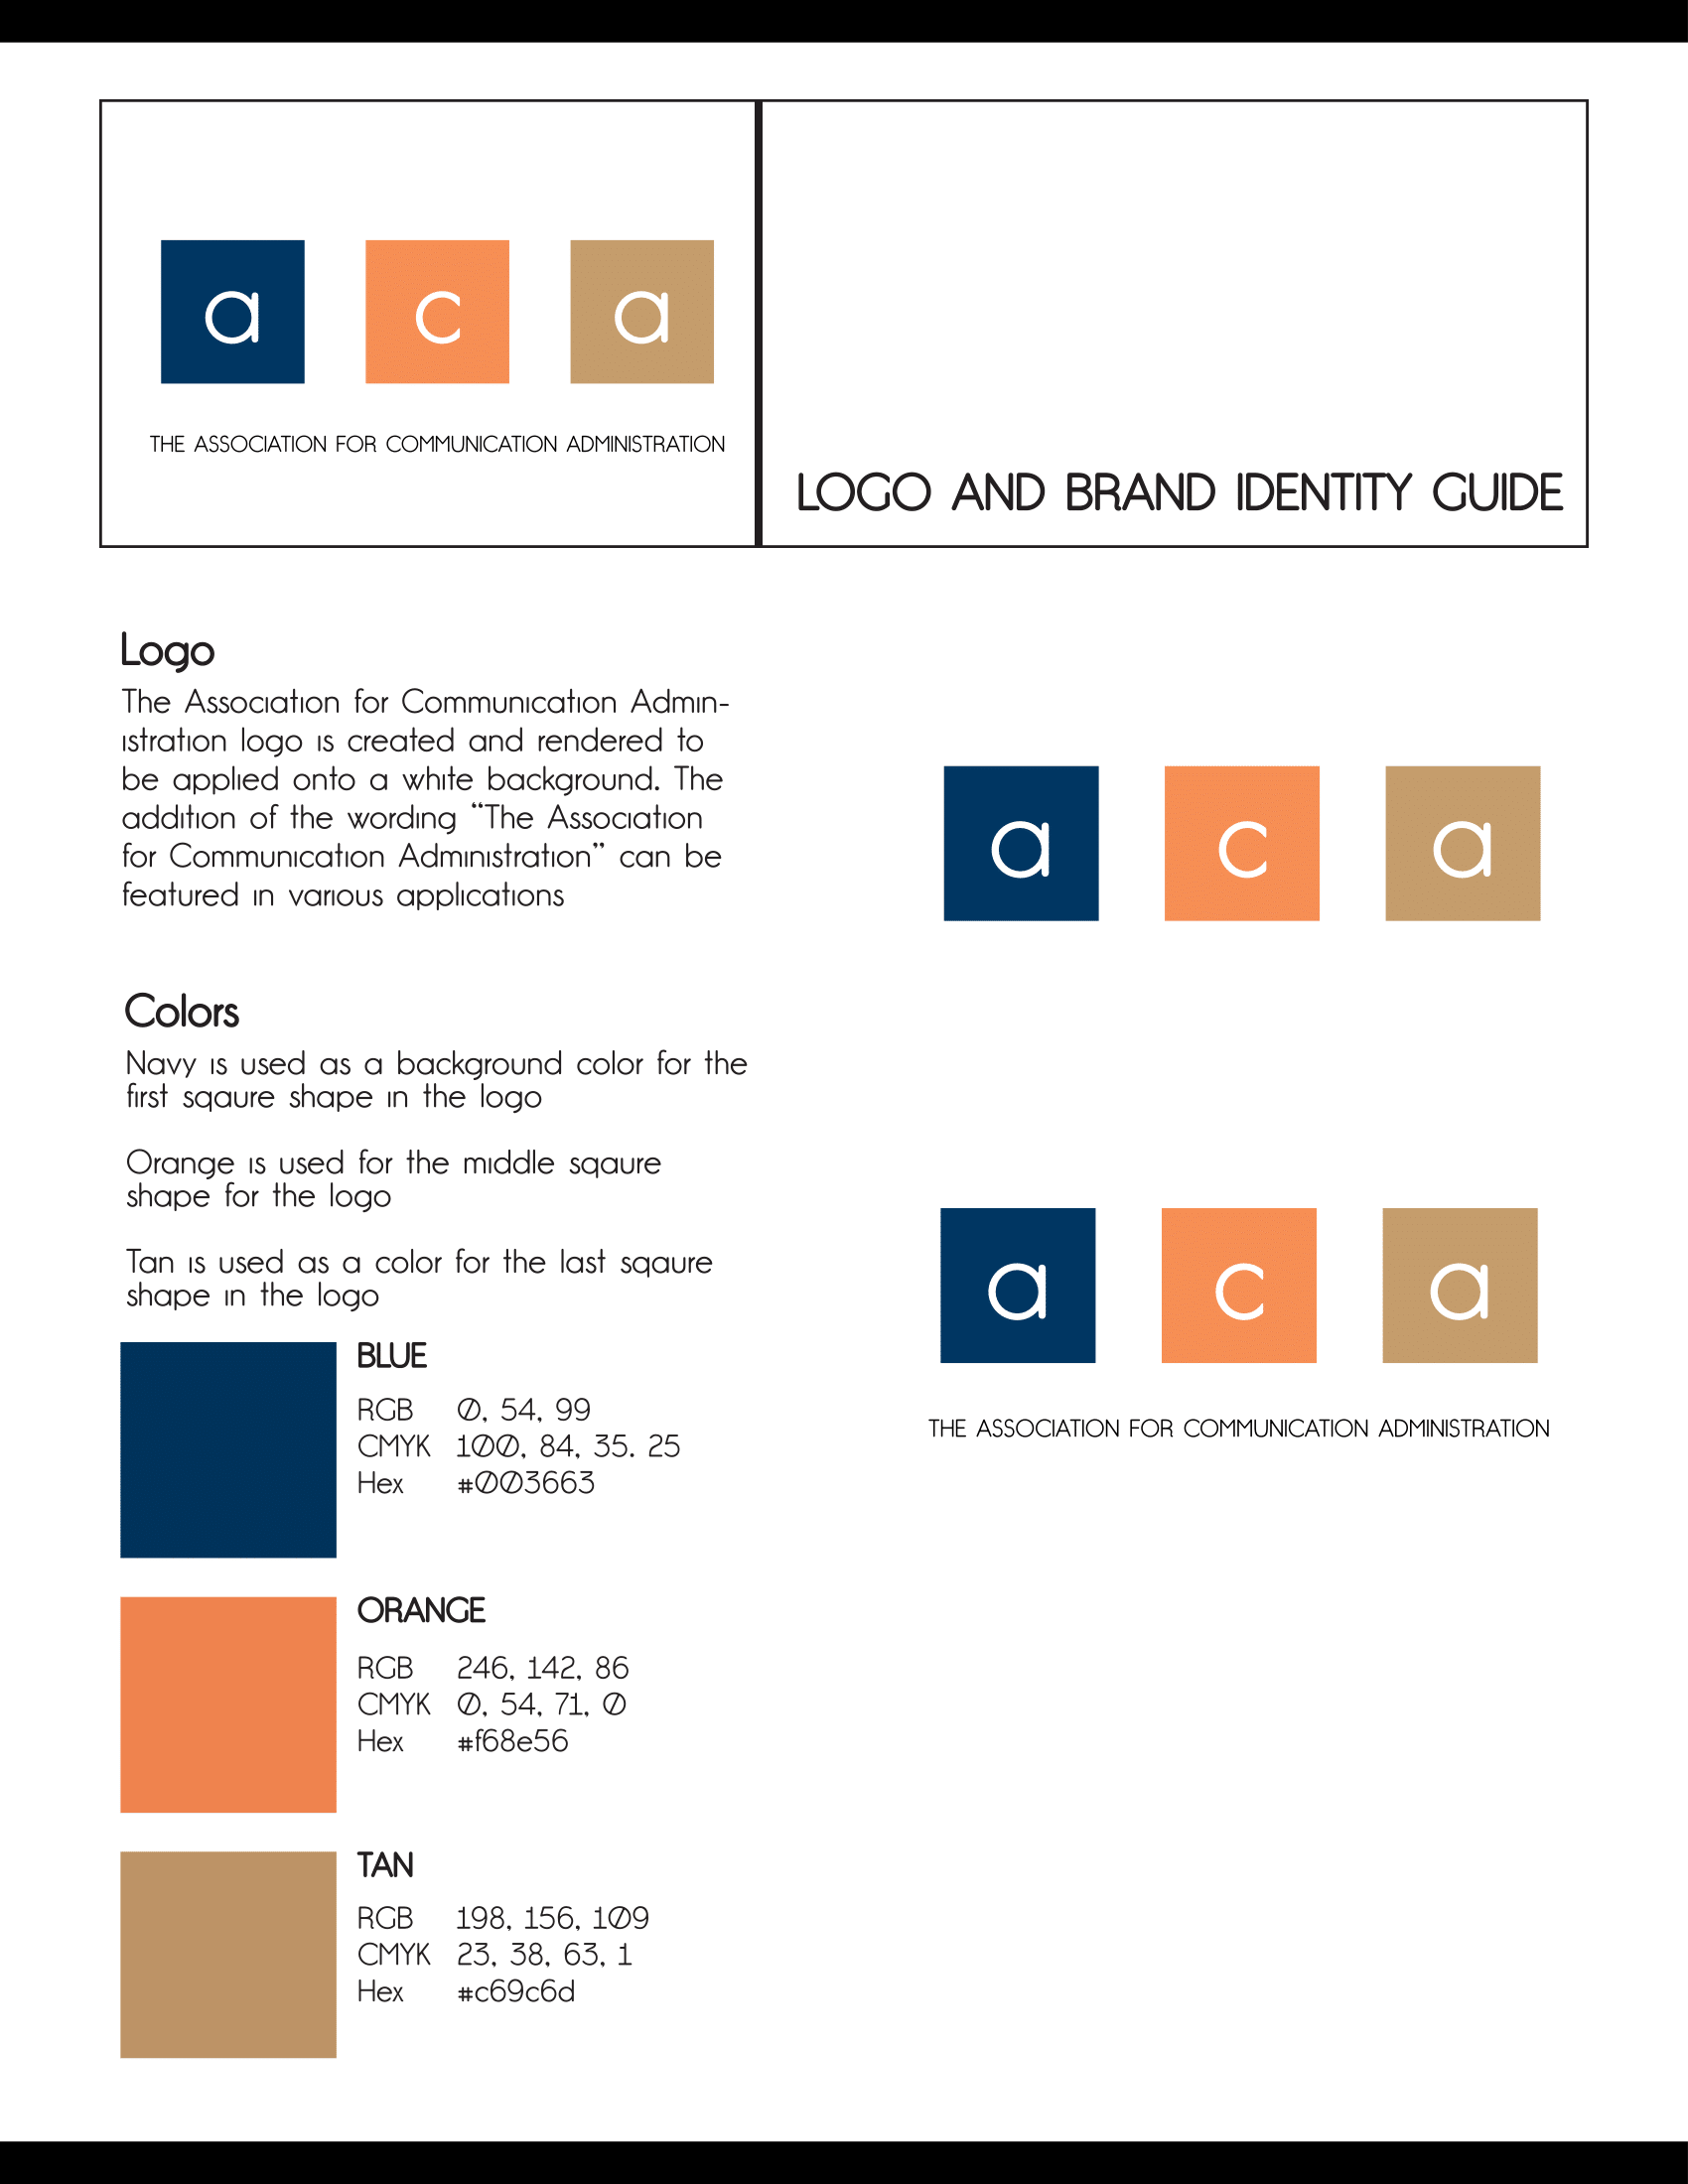 acabrandidentity111-1.png